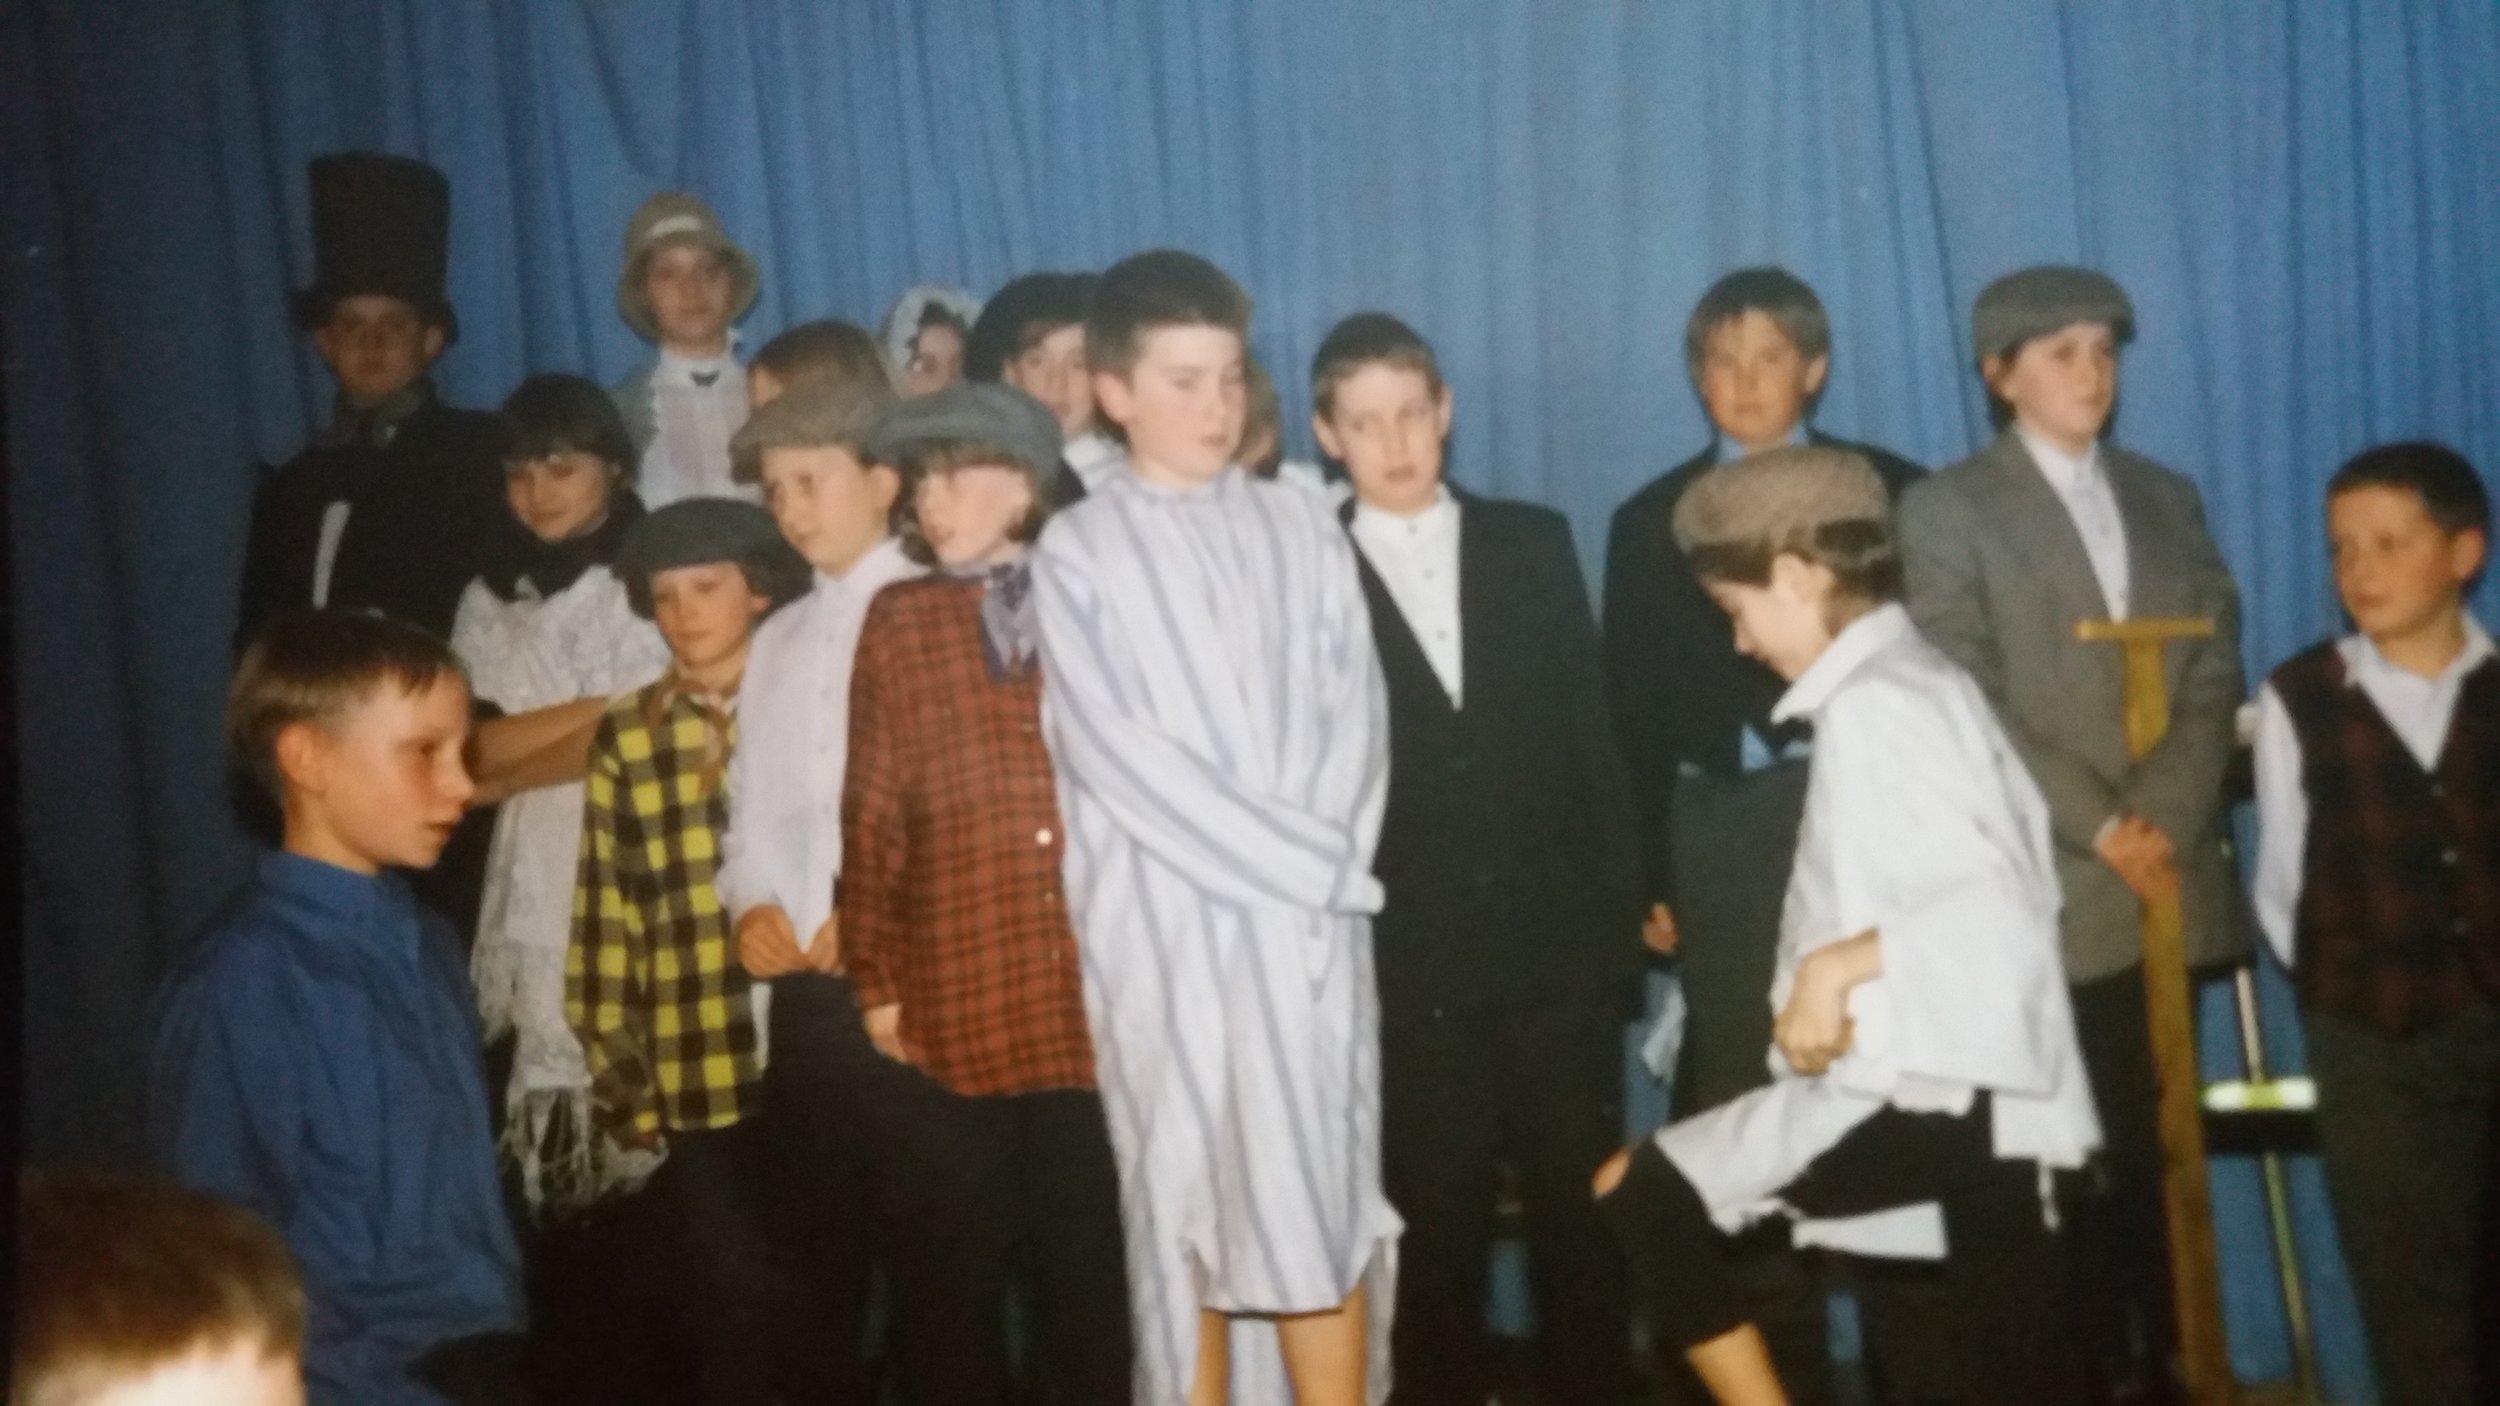 Me (centre) in a nightshirt, as Ebeneezer Scrooge